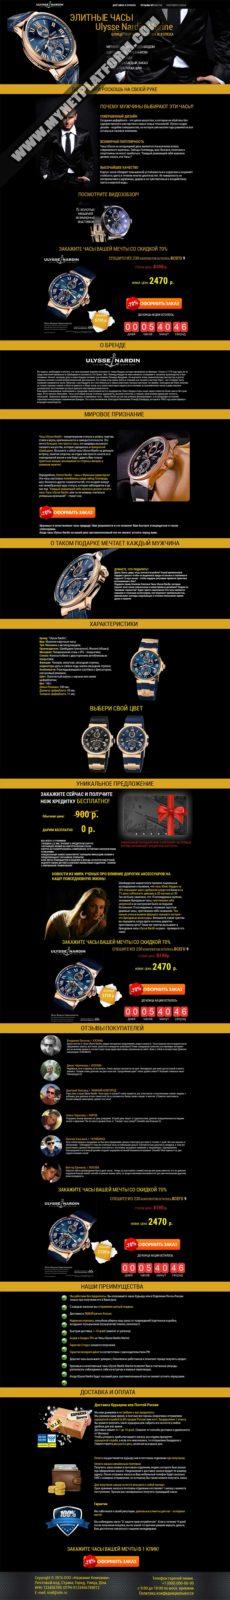 Скриншот лендинга Часы Ulysse Nardin Suisse 003